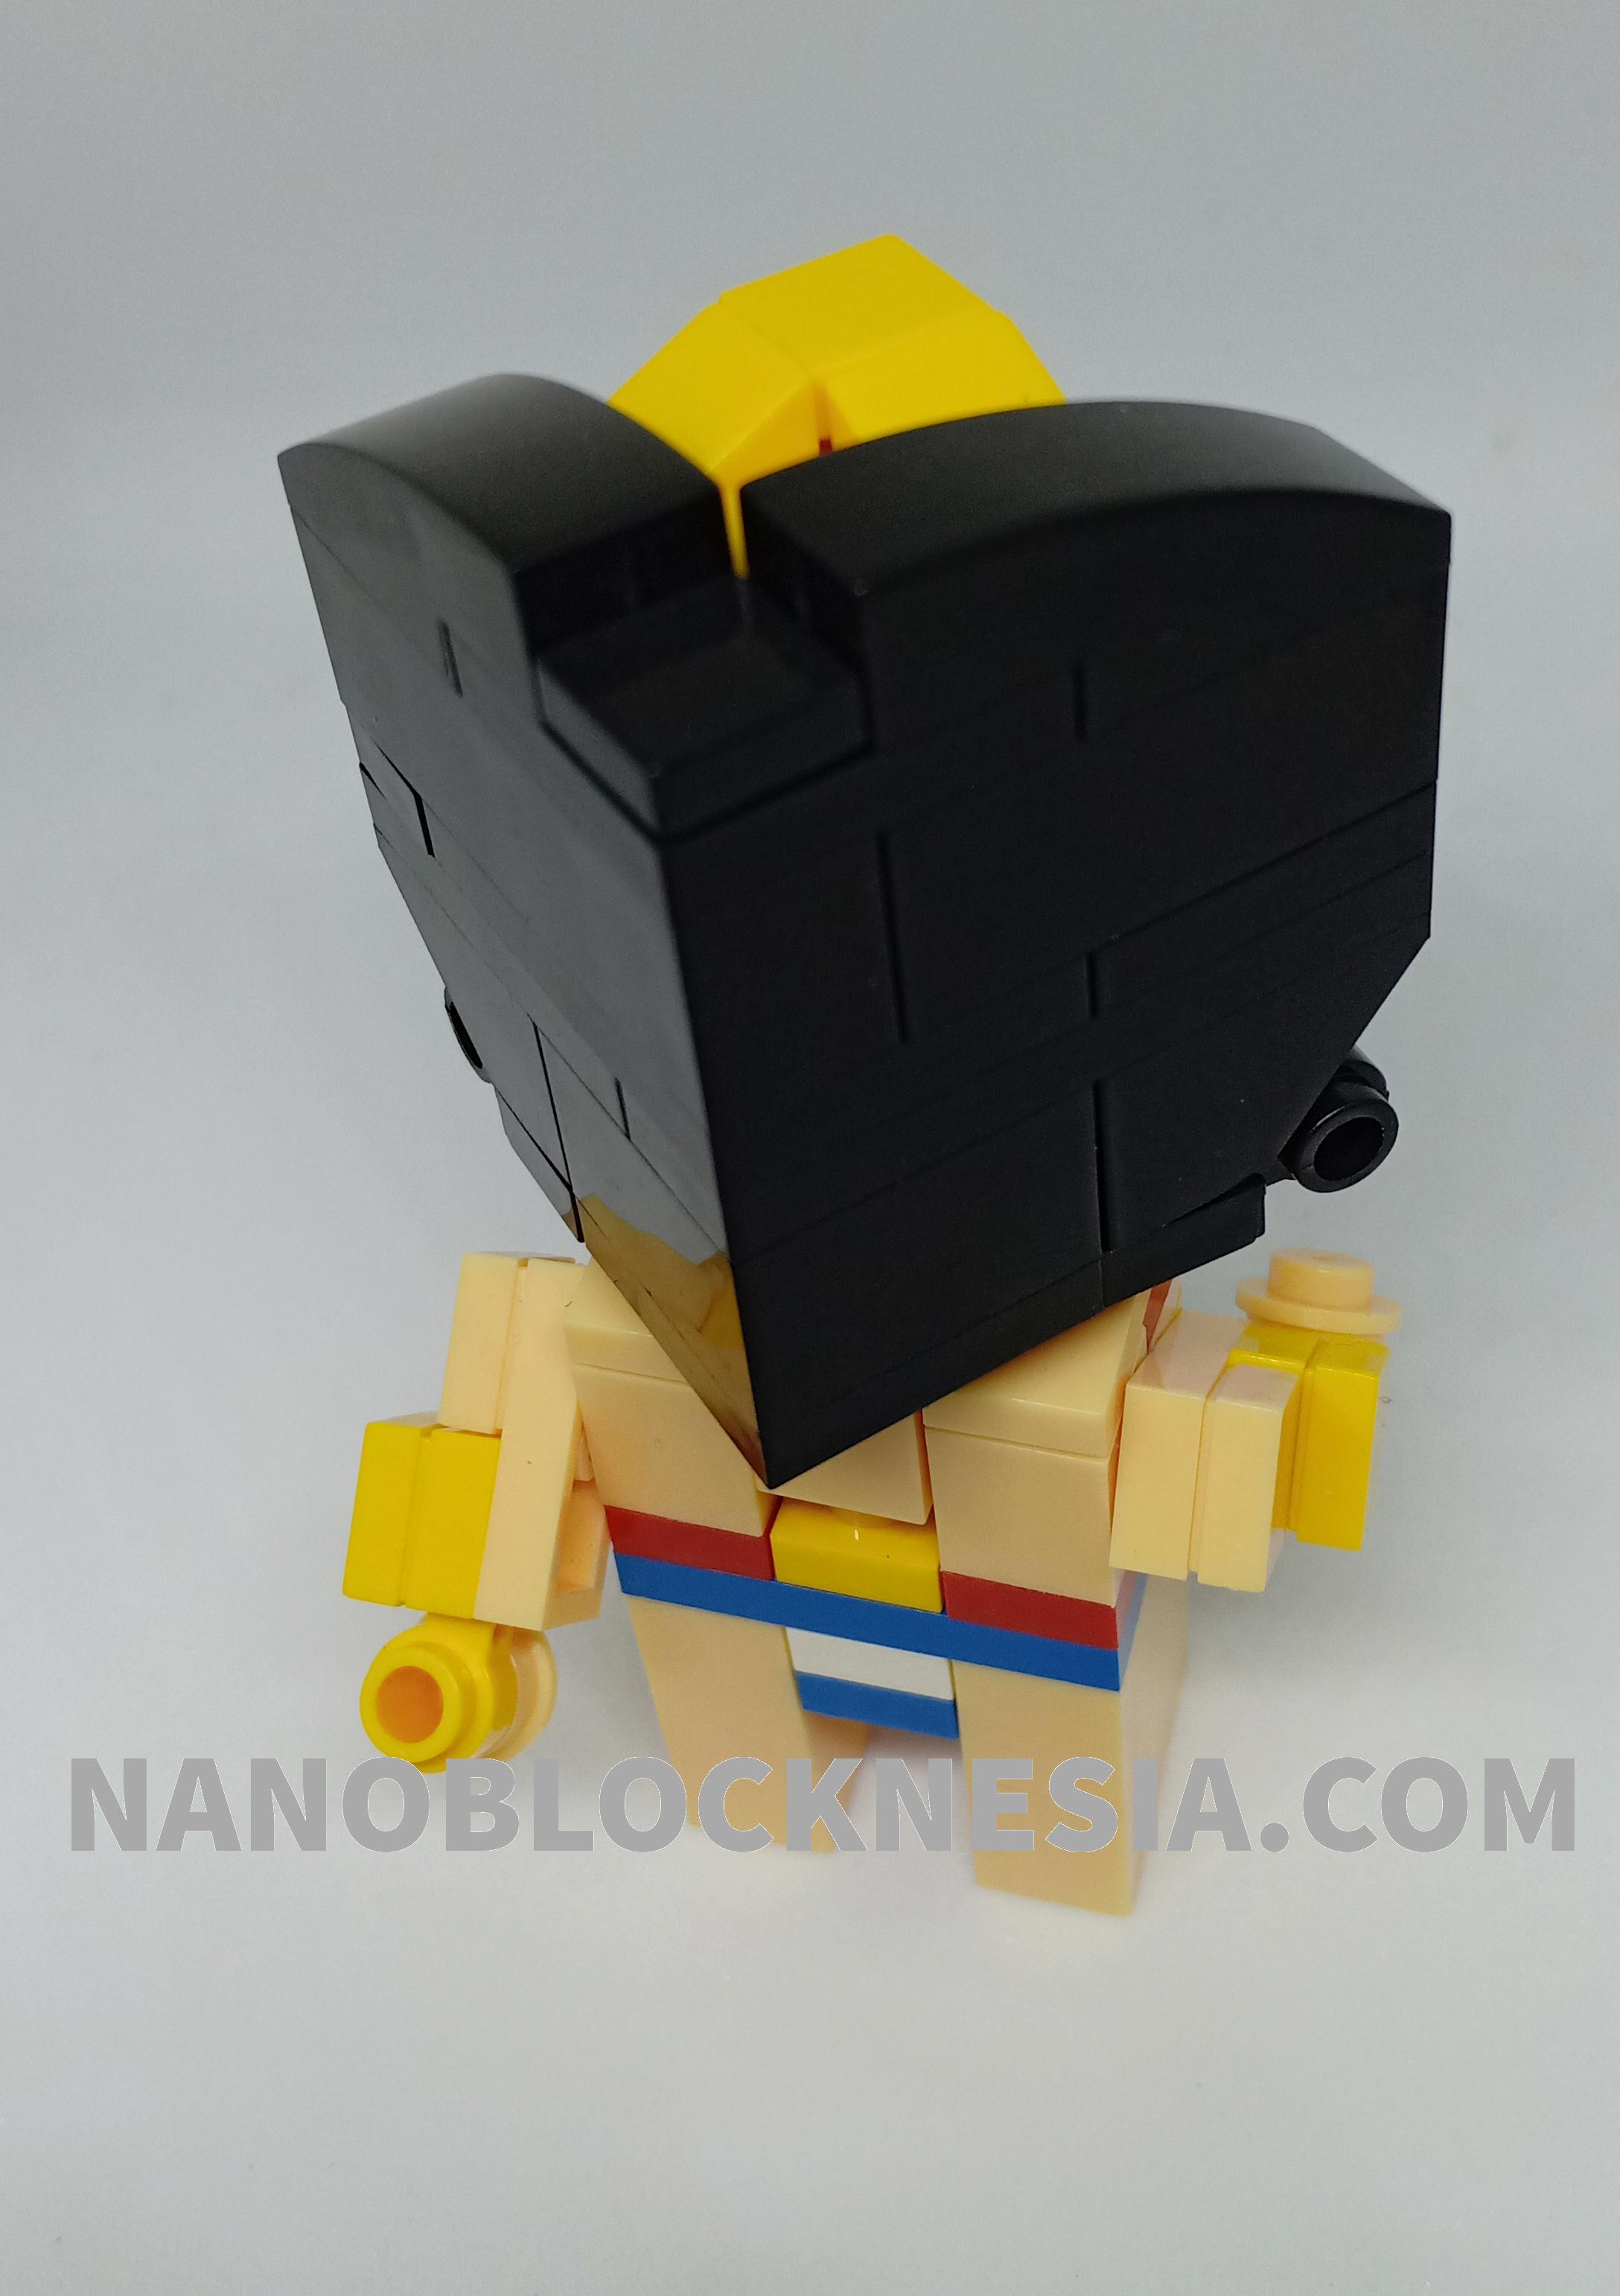 Building Wonder Woman With Nanoblock Minicbrick